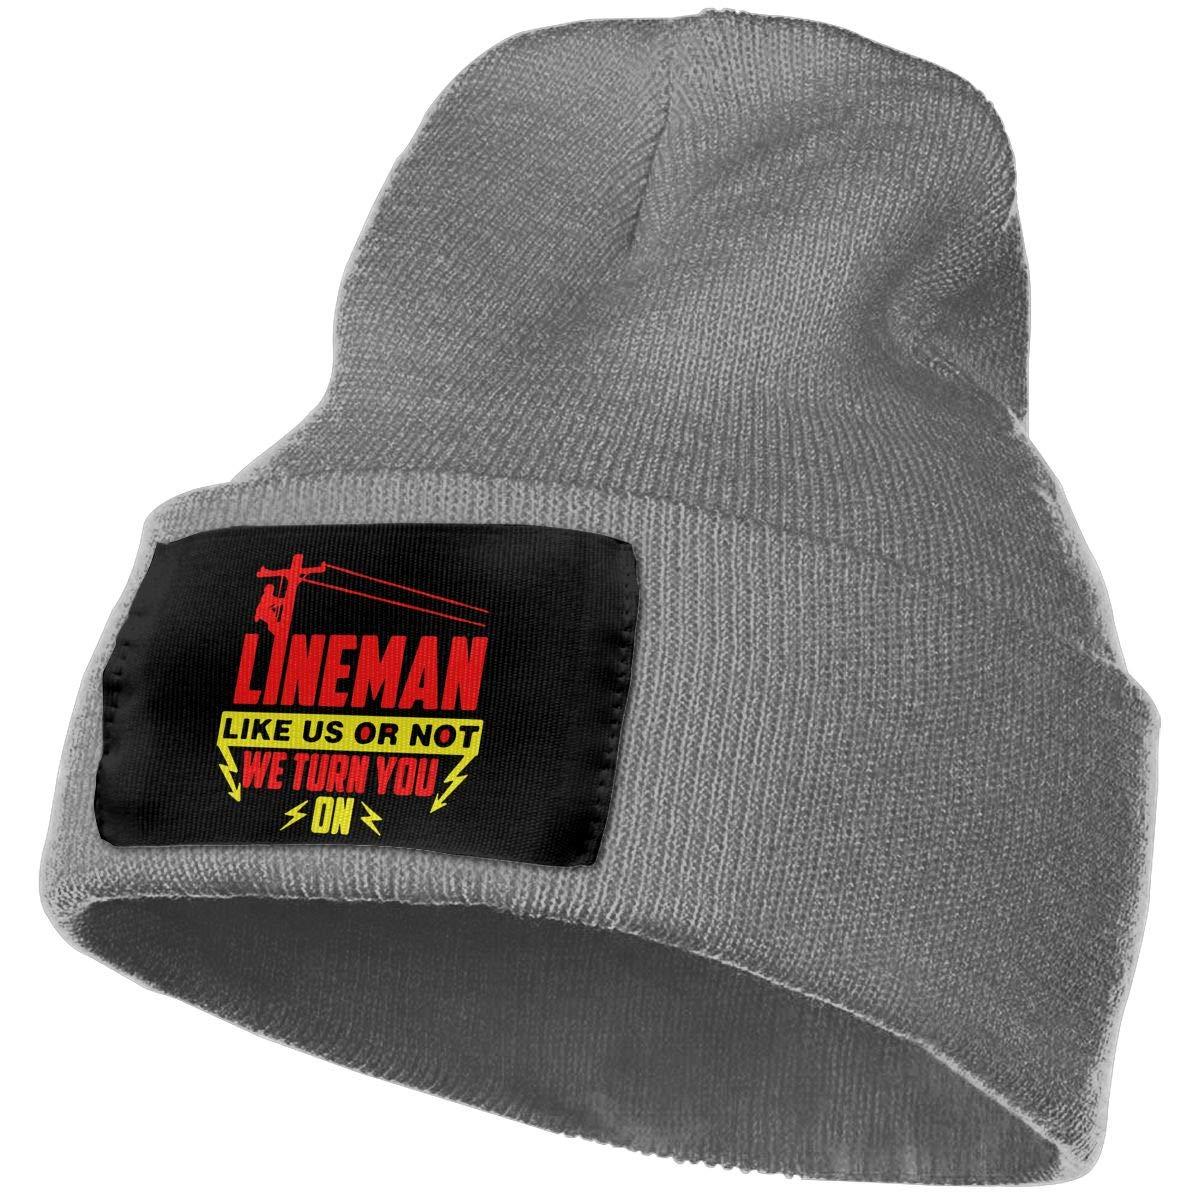 Lineman Like US Turn You On Unisex 3D Knitted Hat Skull Hat Beanie Cap